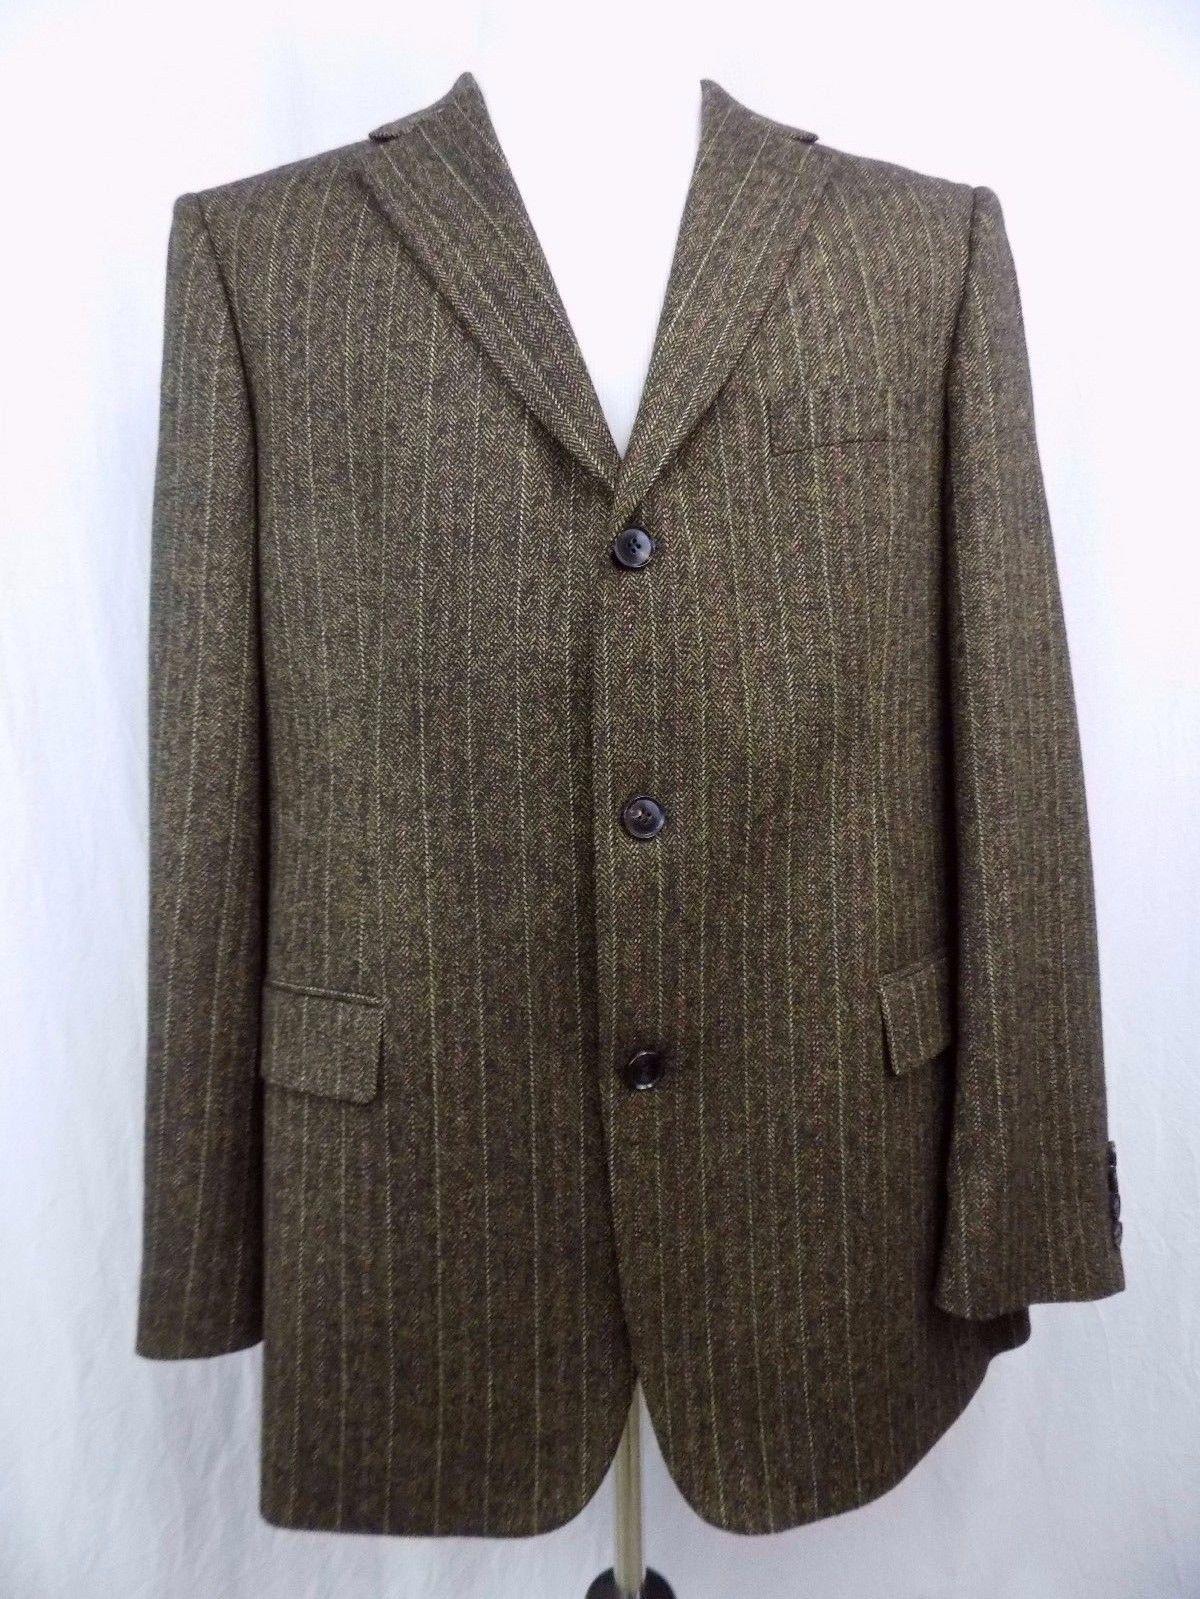 80d239b8 S l1600. S l1600. Previous. Hugo Boss Men Sport Coat Blazer Brown Tweed Wool  Blend Made in USA 44R 44 R